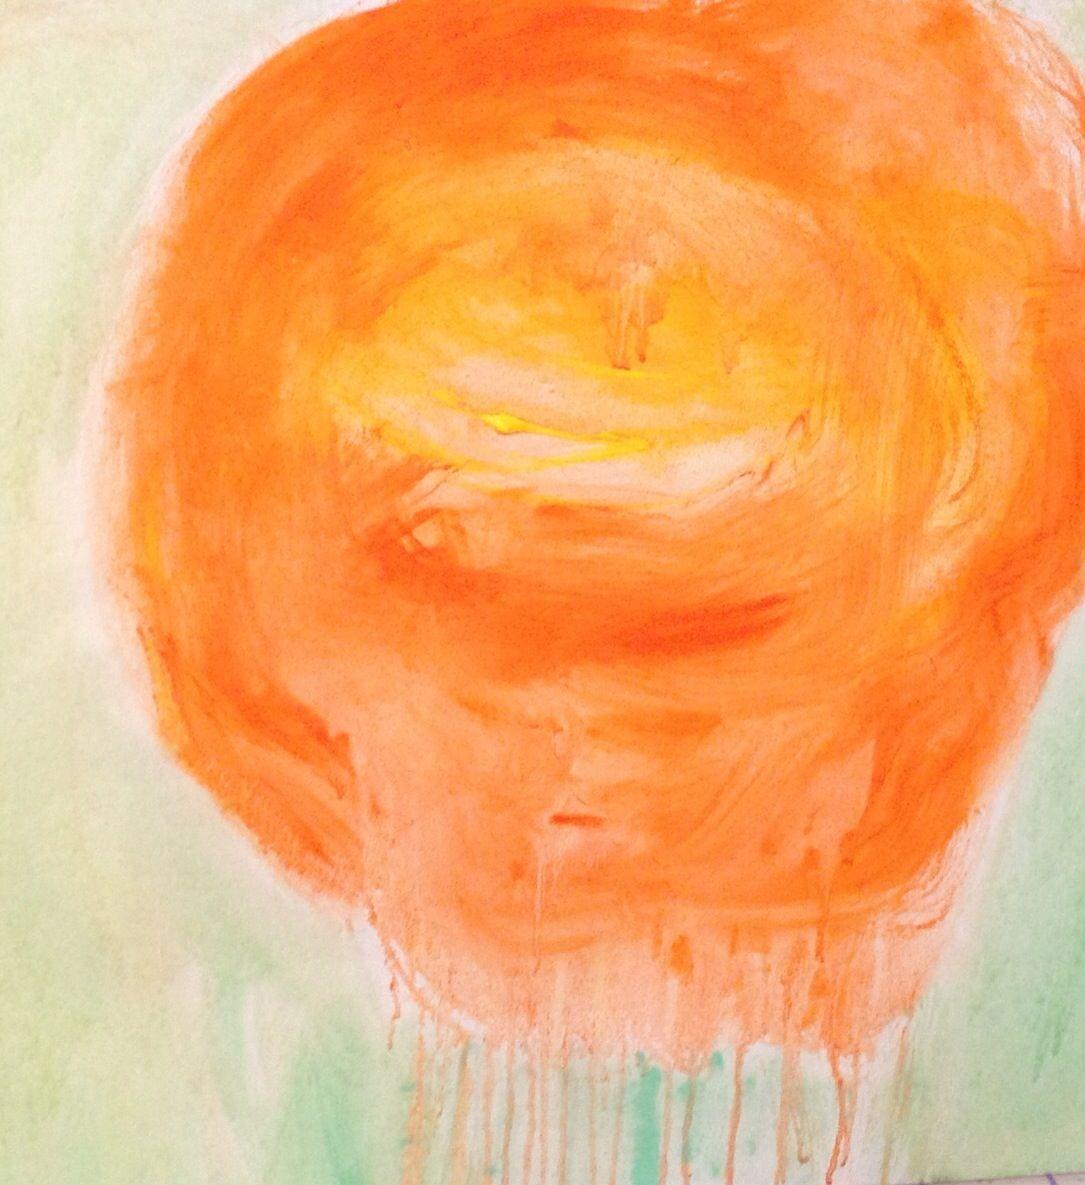 Drippy clementine by Kerri Rosenthal